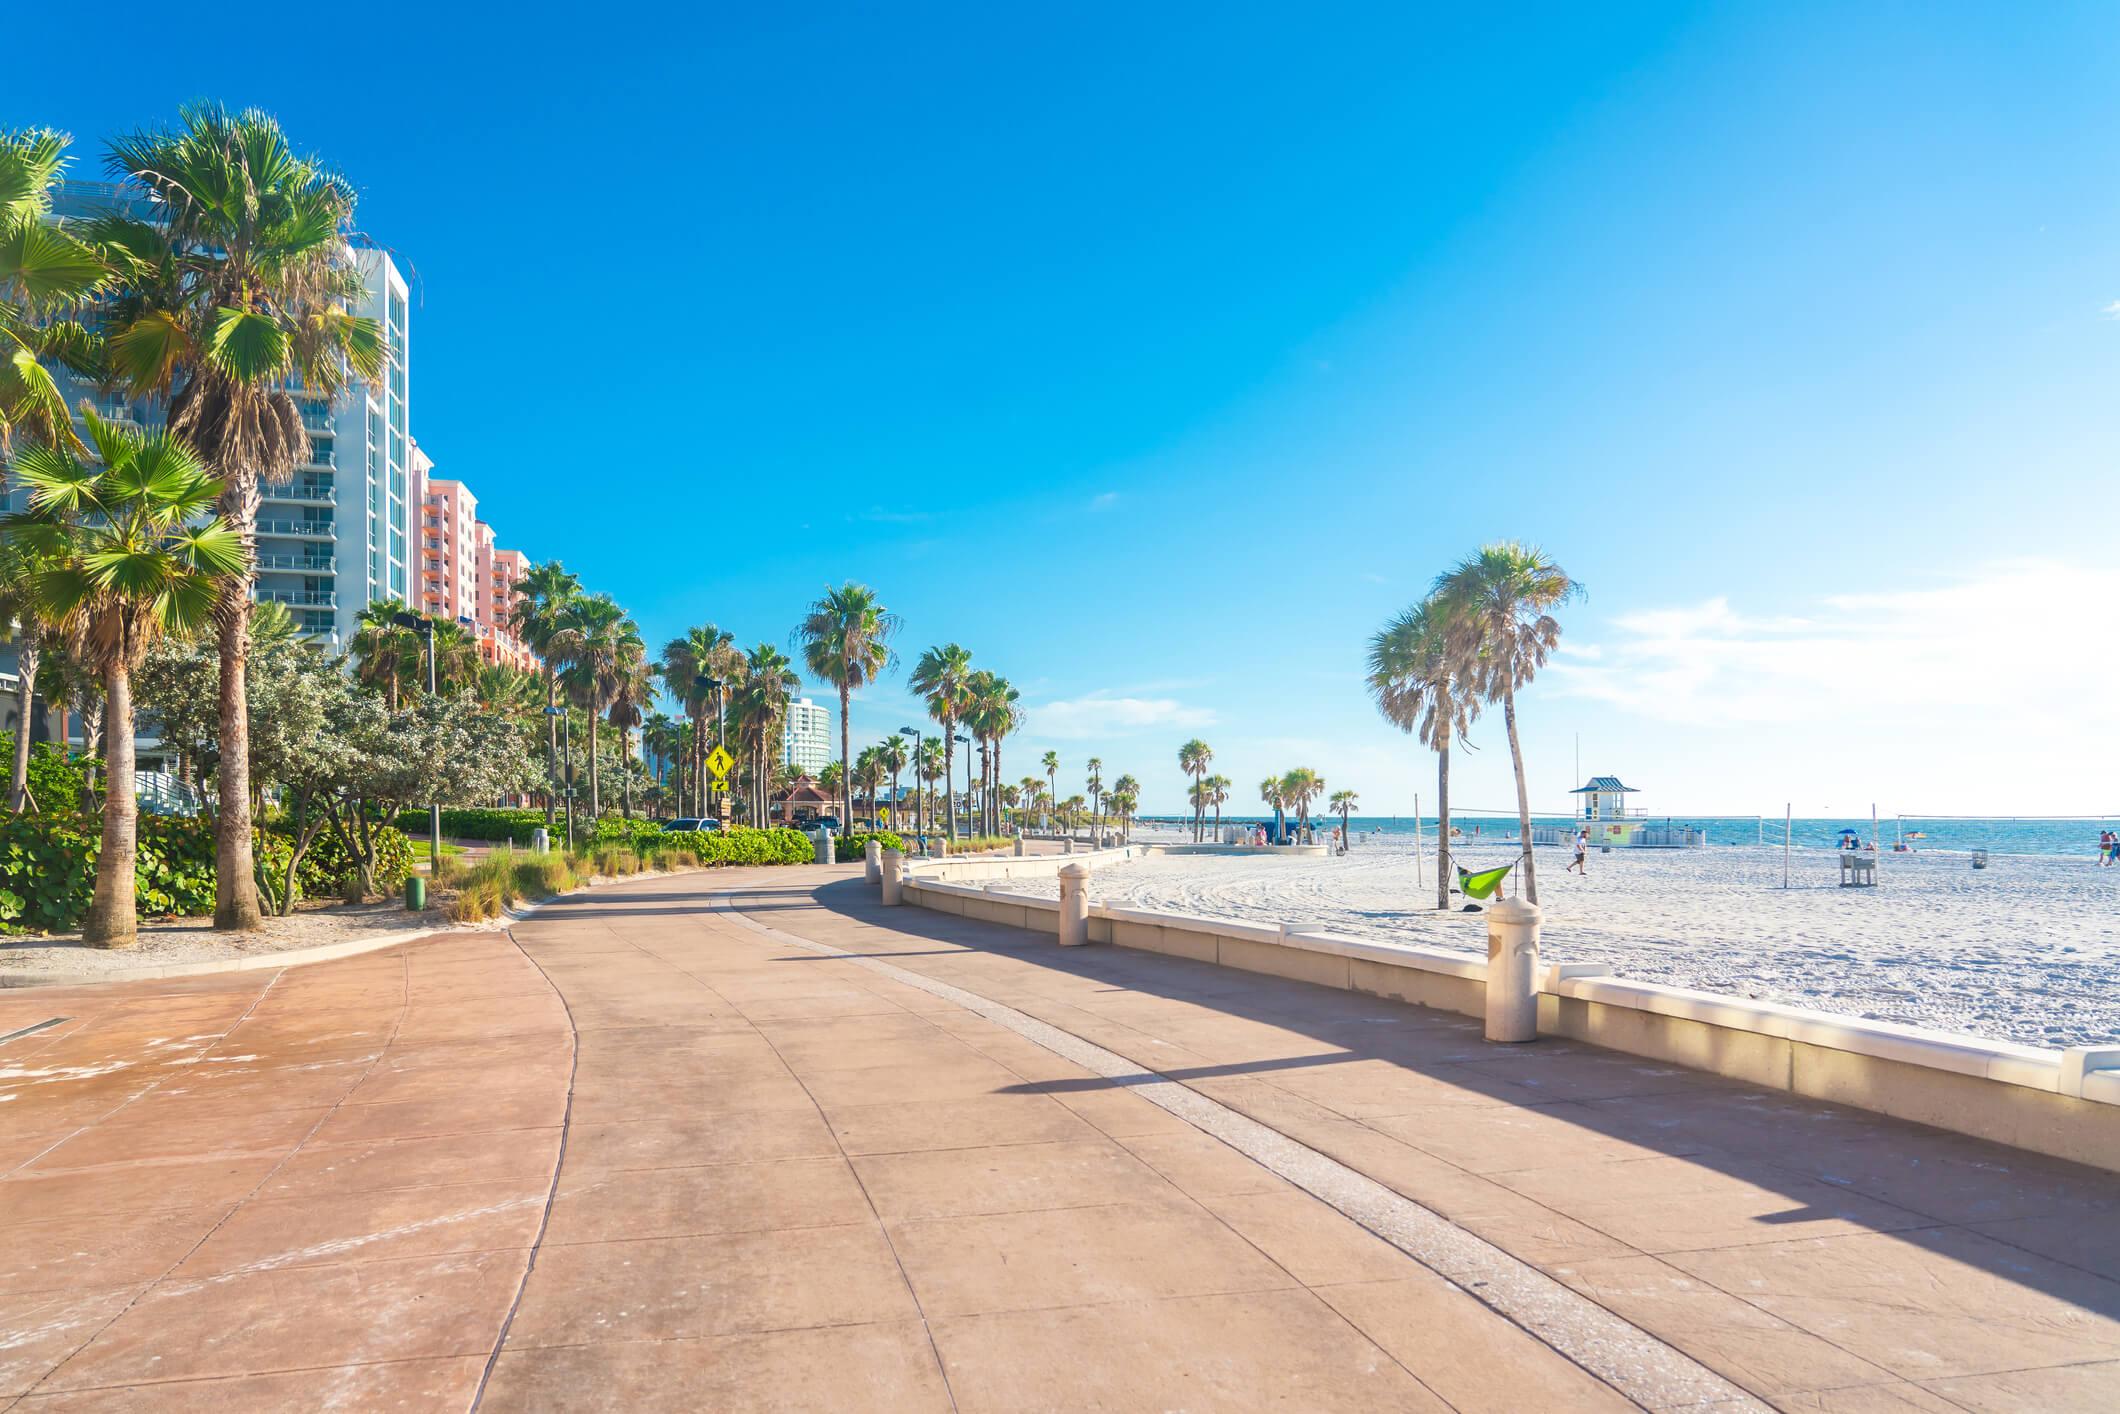 Best Senior Friendly Beaches near Citrus Park - Clearwater